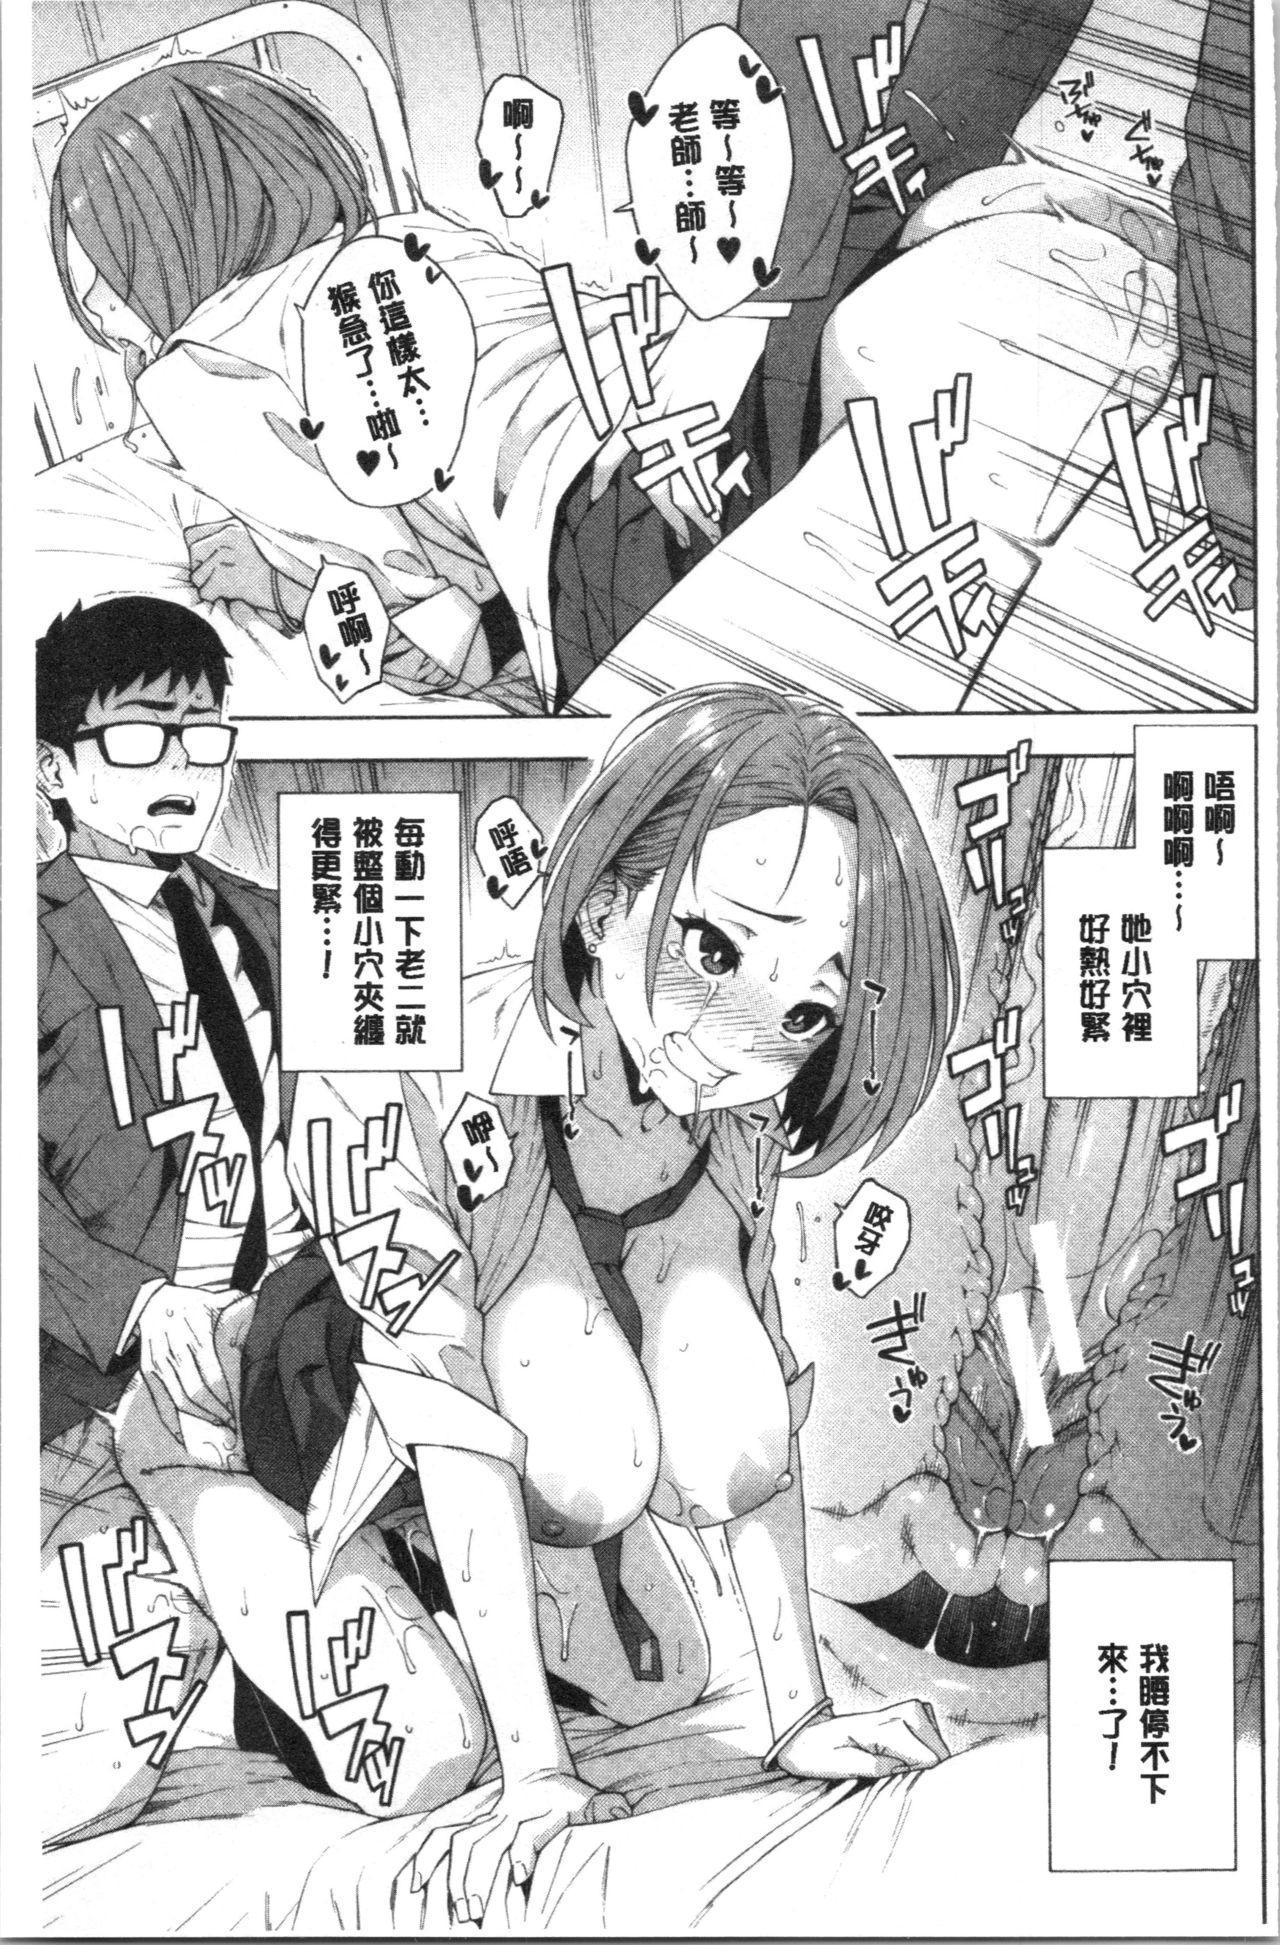 Okashite Ageru | 讓你來侵犯我 35